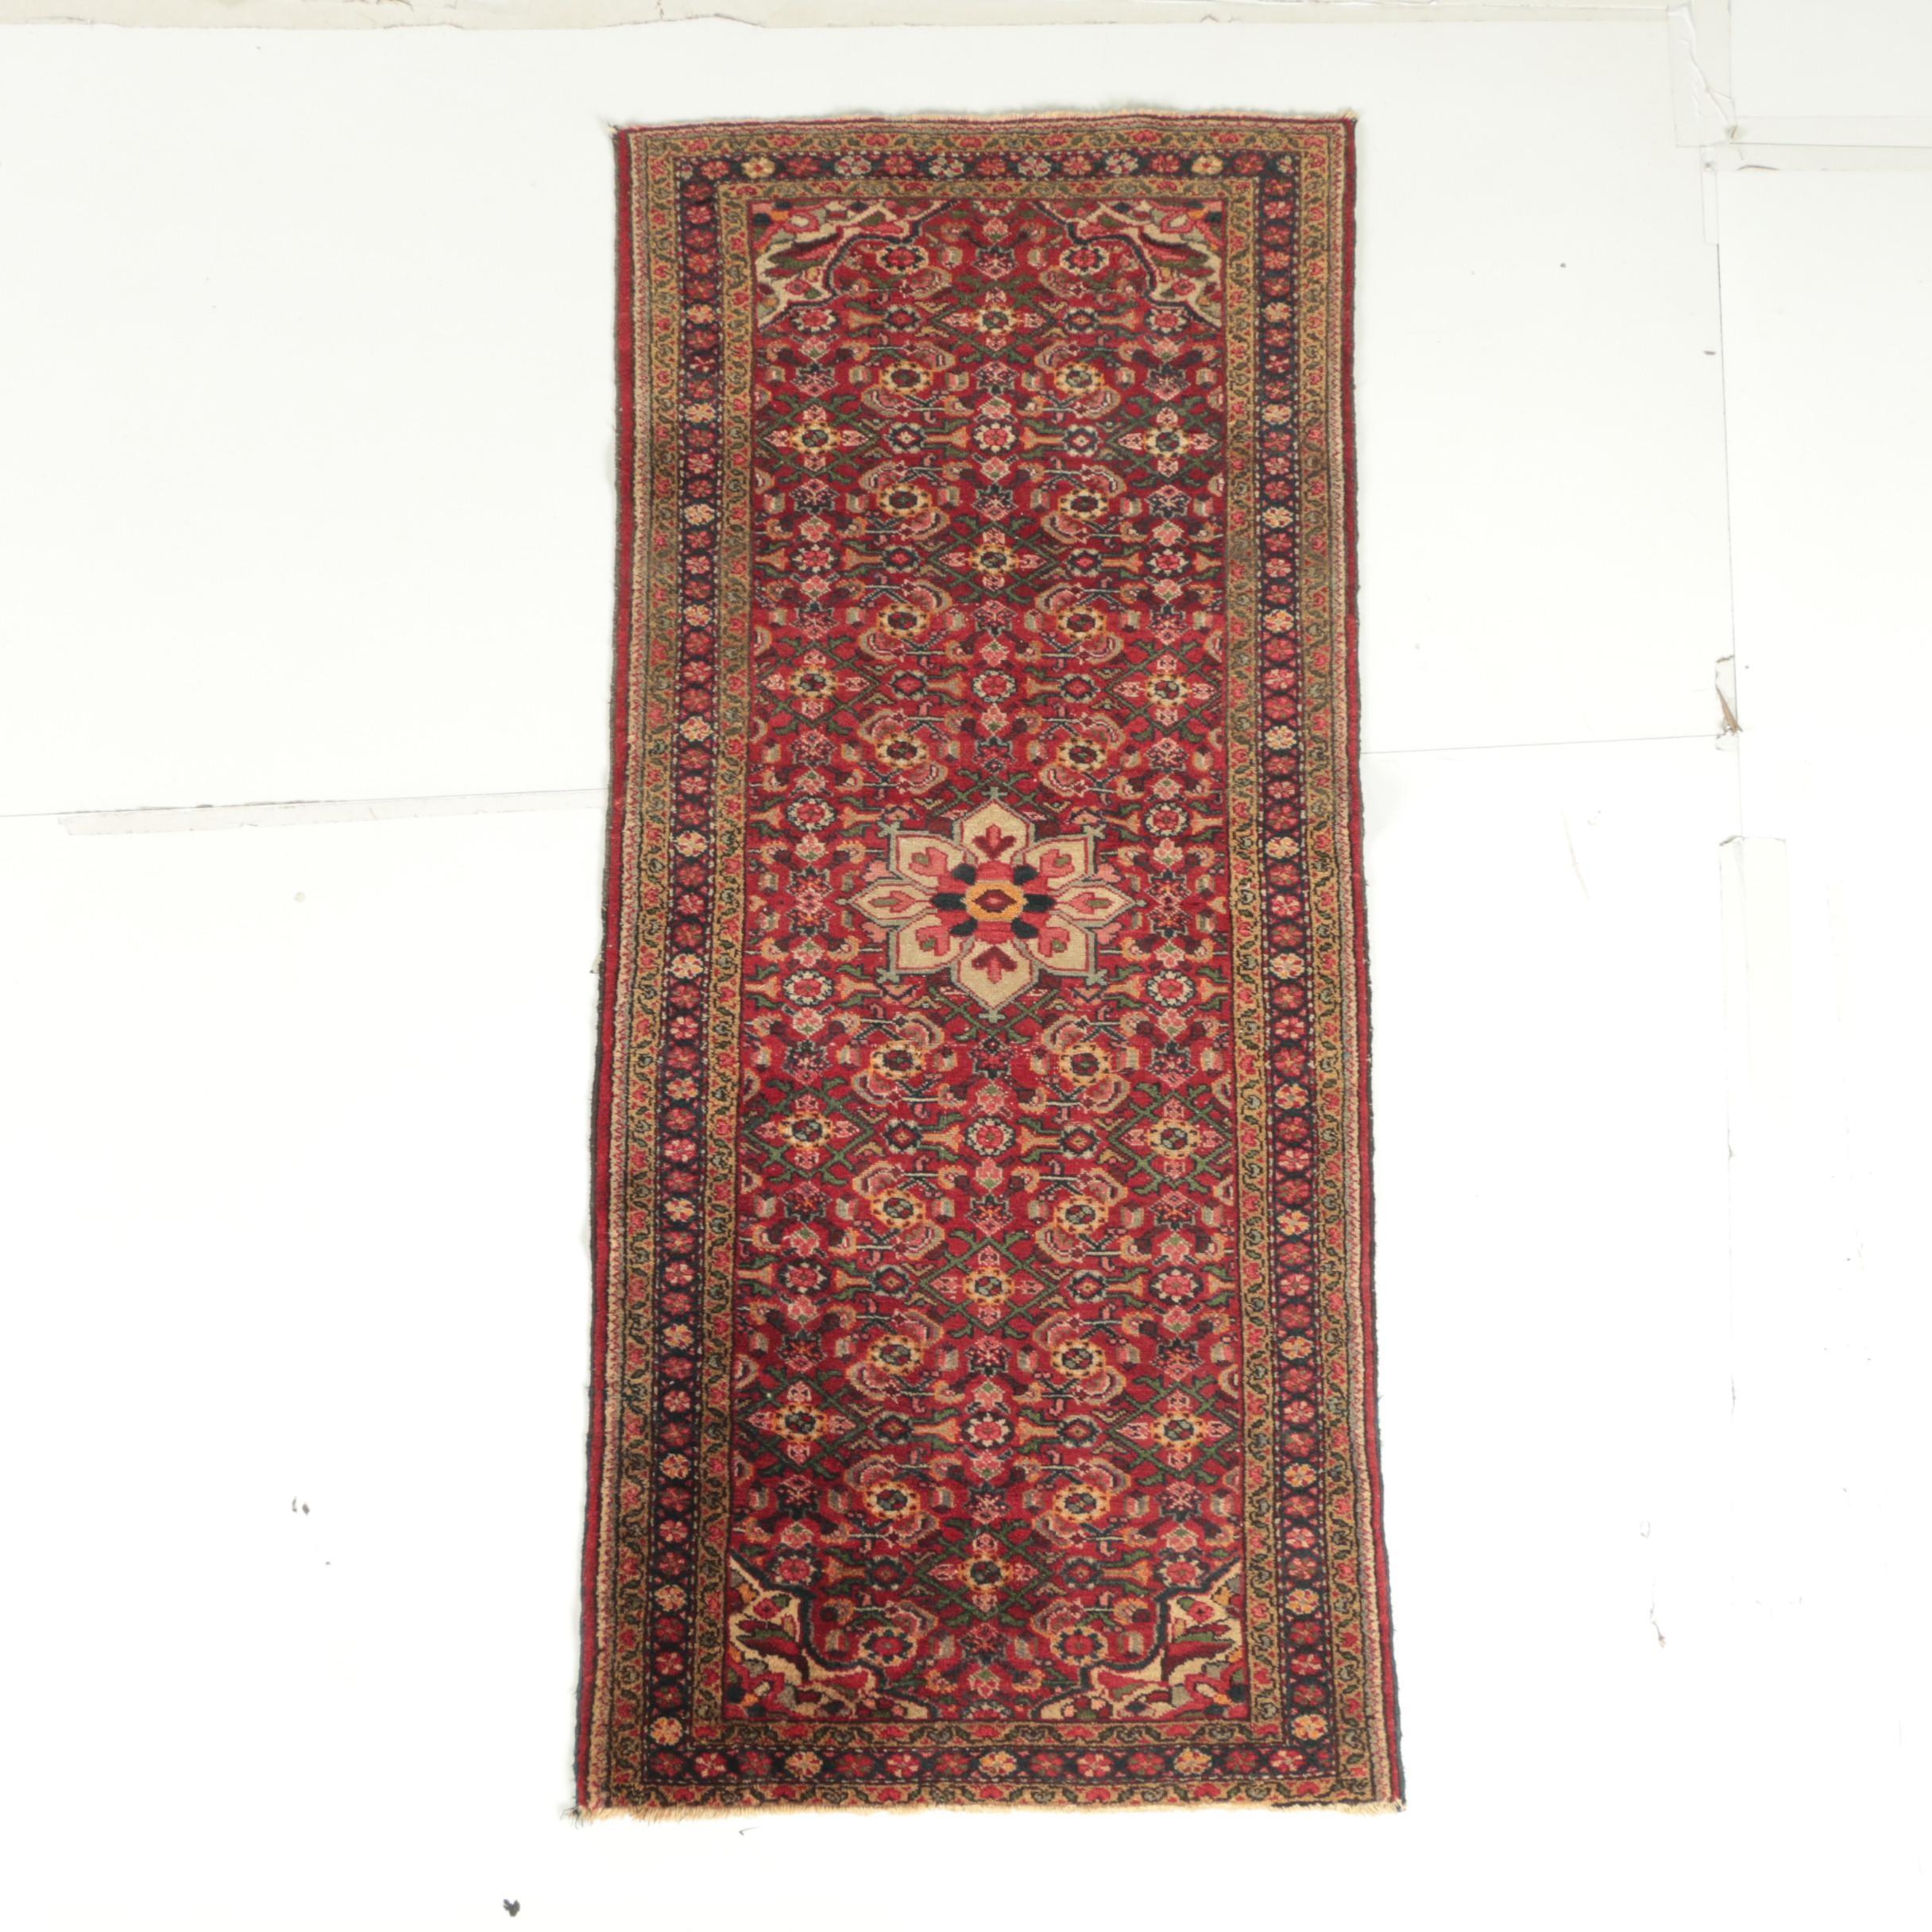 Vintage Hand-Knotted Persian Bijar Wool Carpet Runner